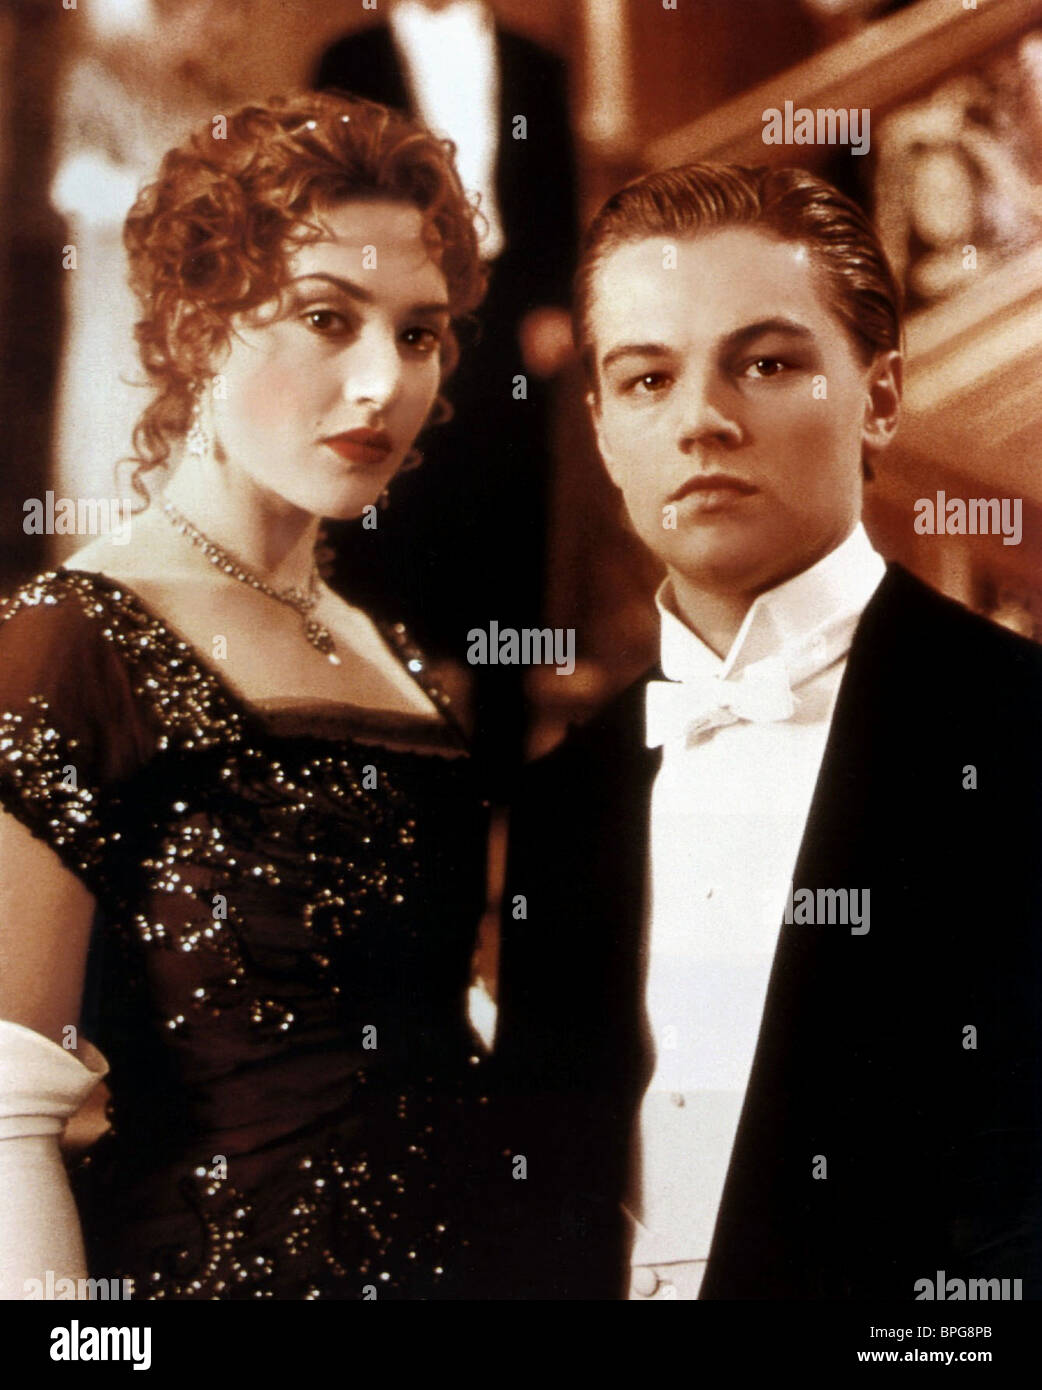 Kate Winslet Leonardo Dicaprio Titanic 1997 Stock Photo Alamy